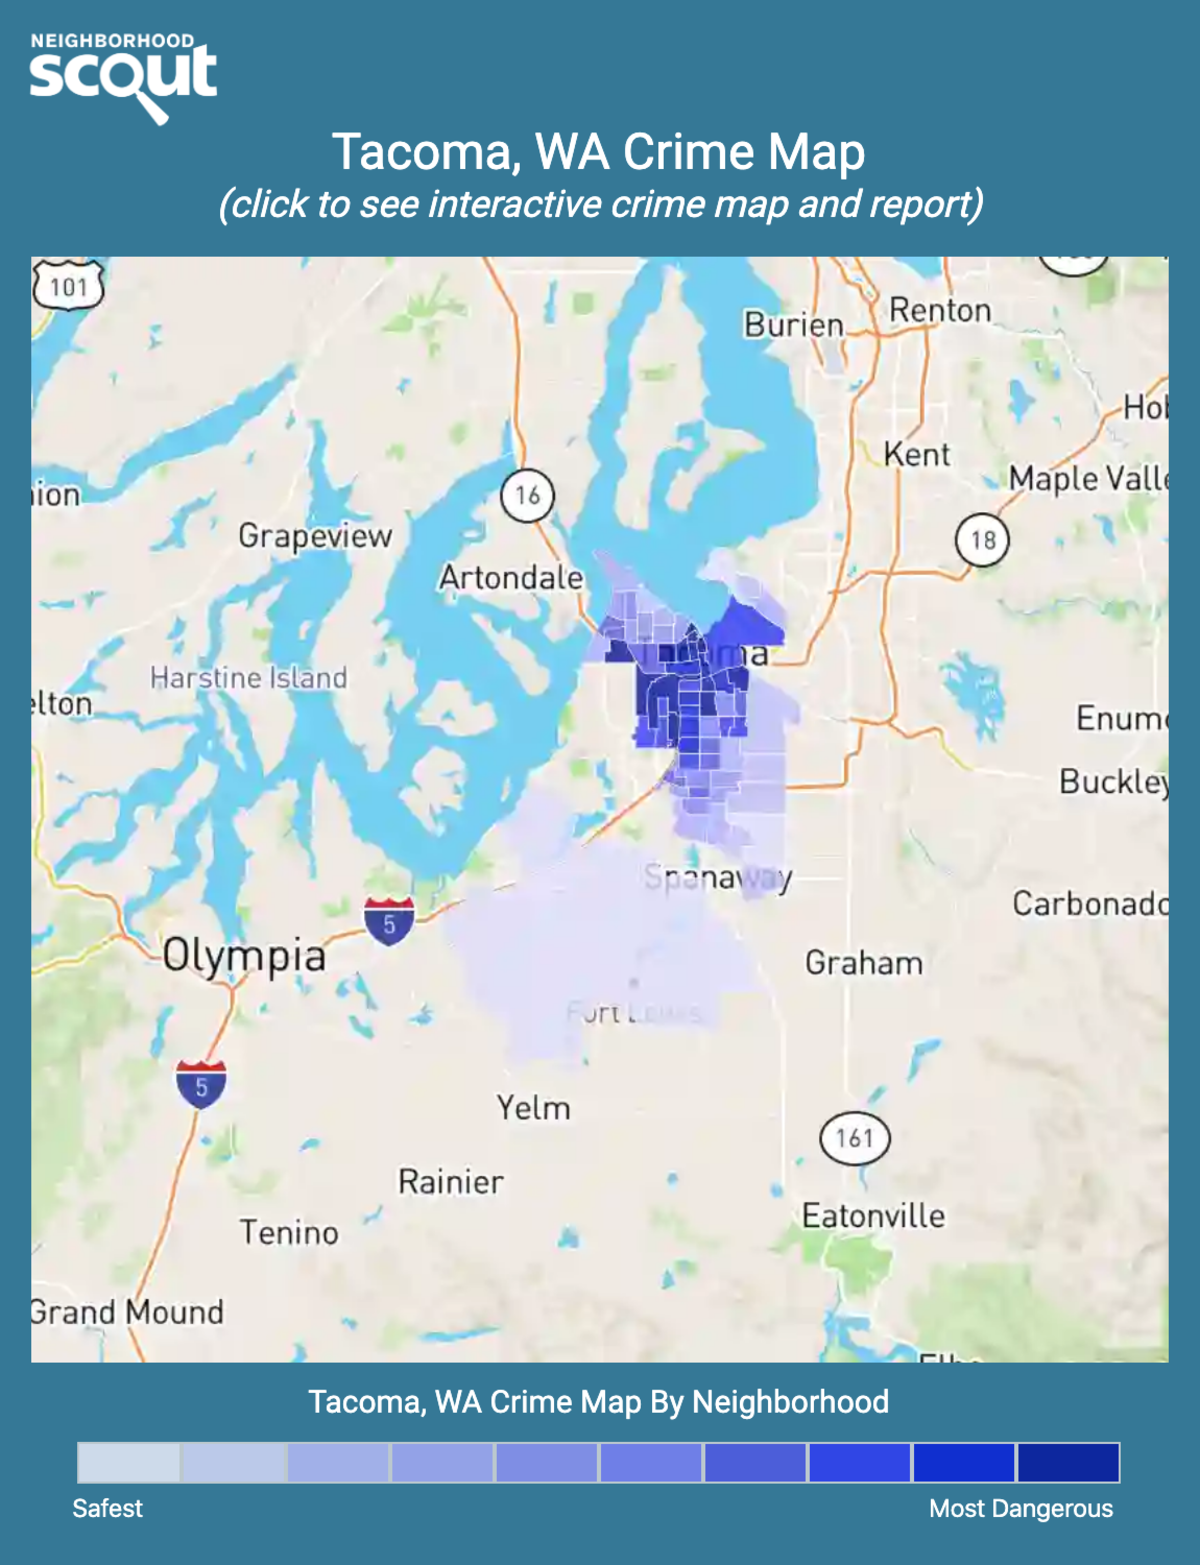 Tacoma, Washington crime map